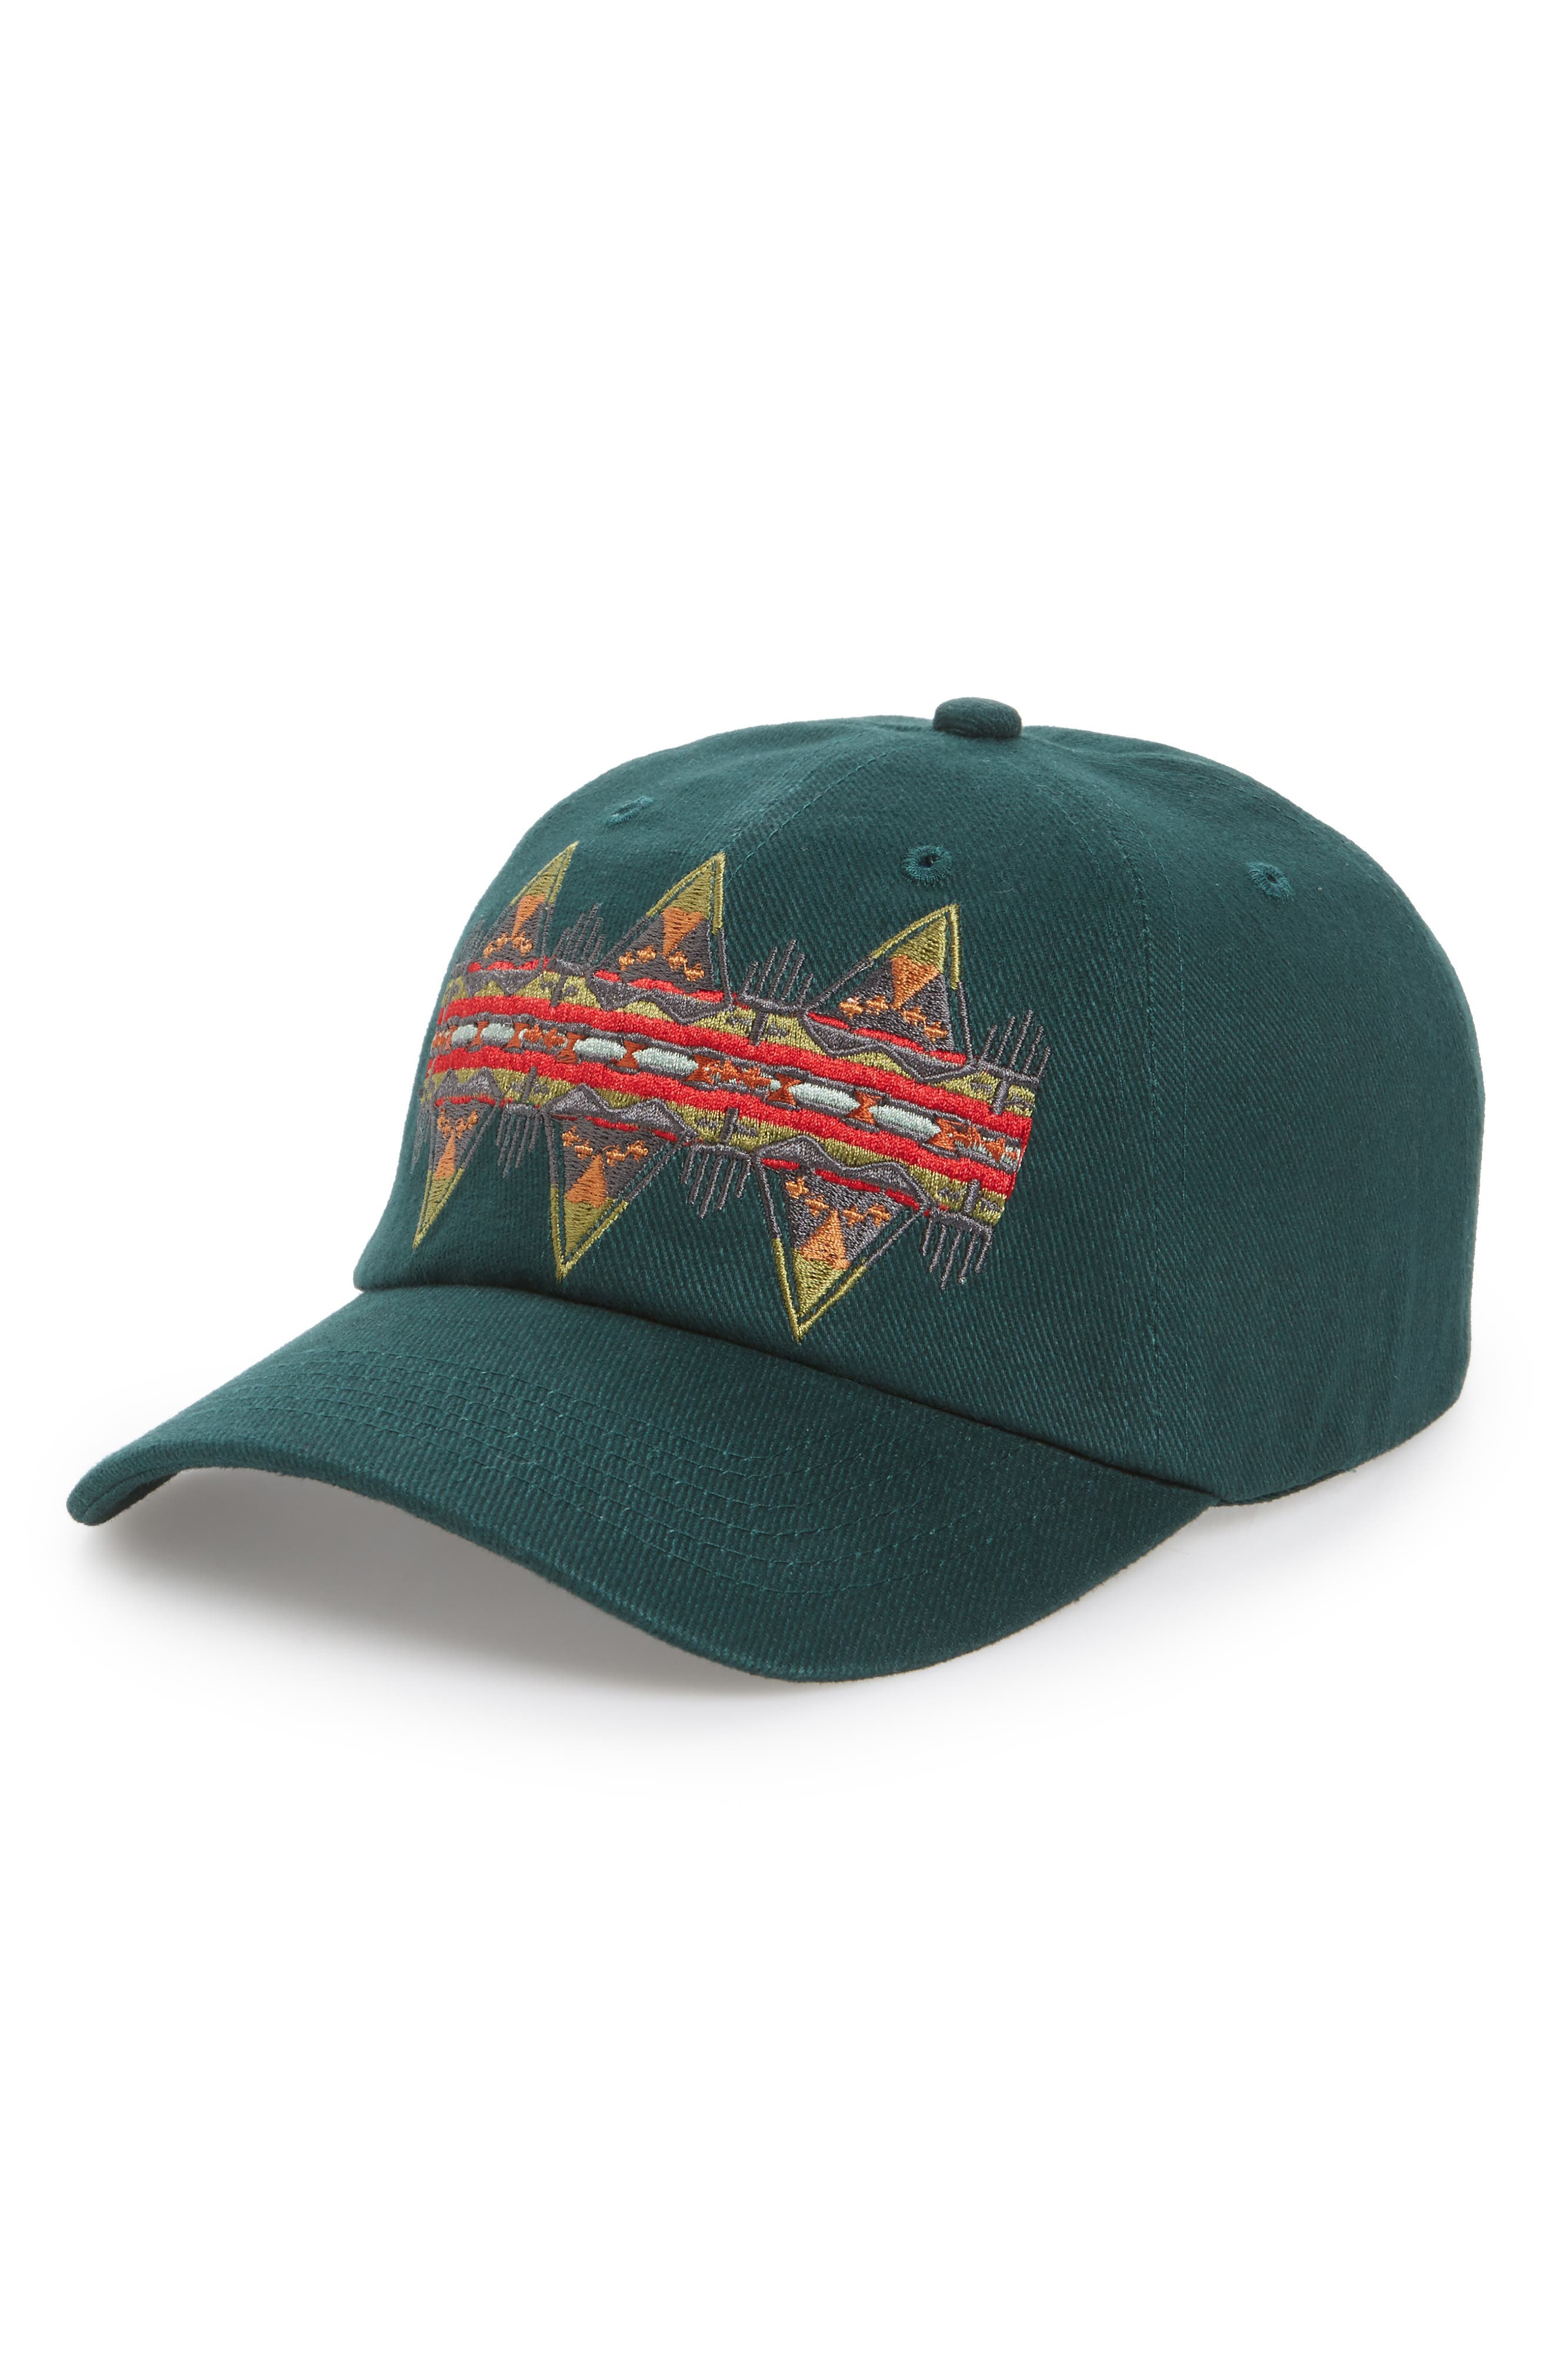 Embroidered Ball Cap,                             Main thumbnail 1, color,